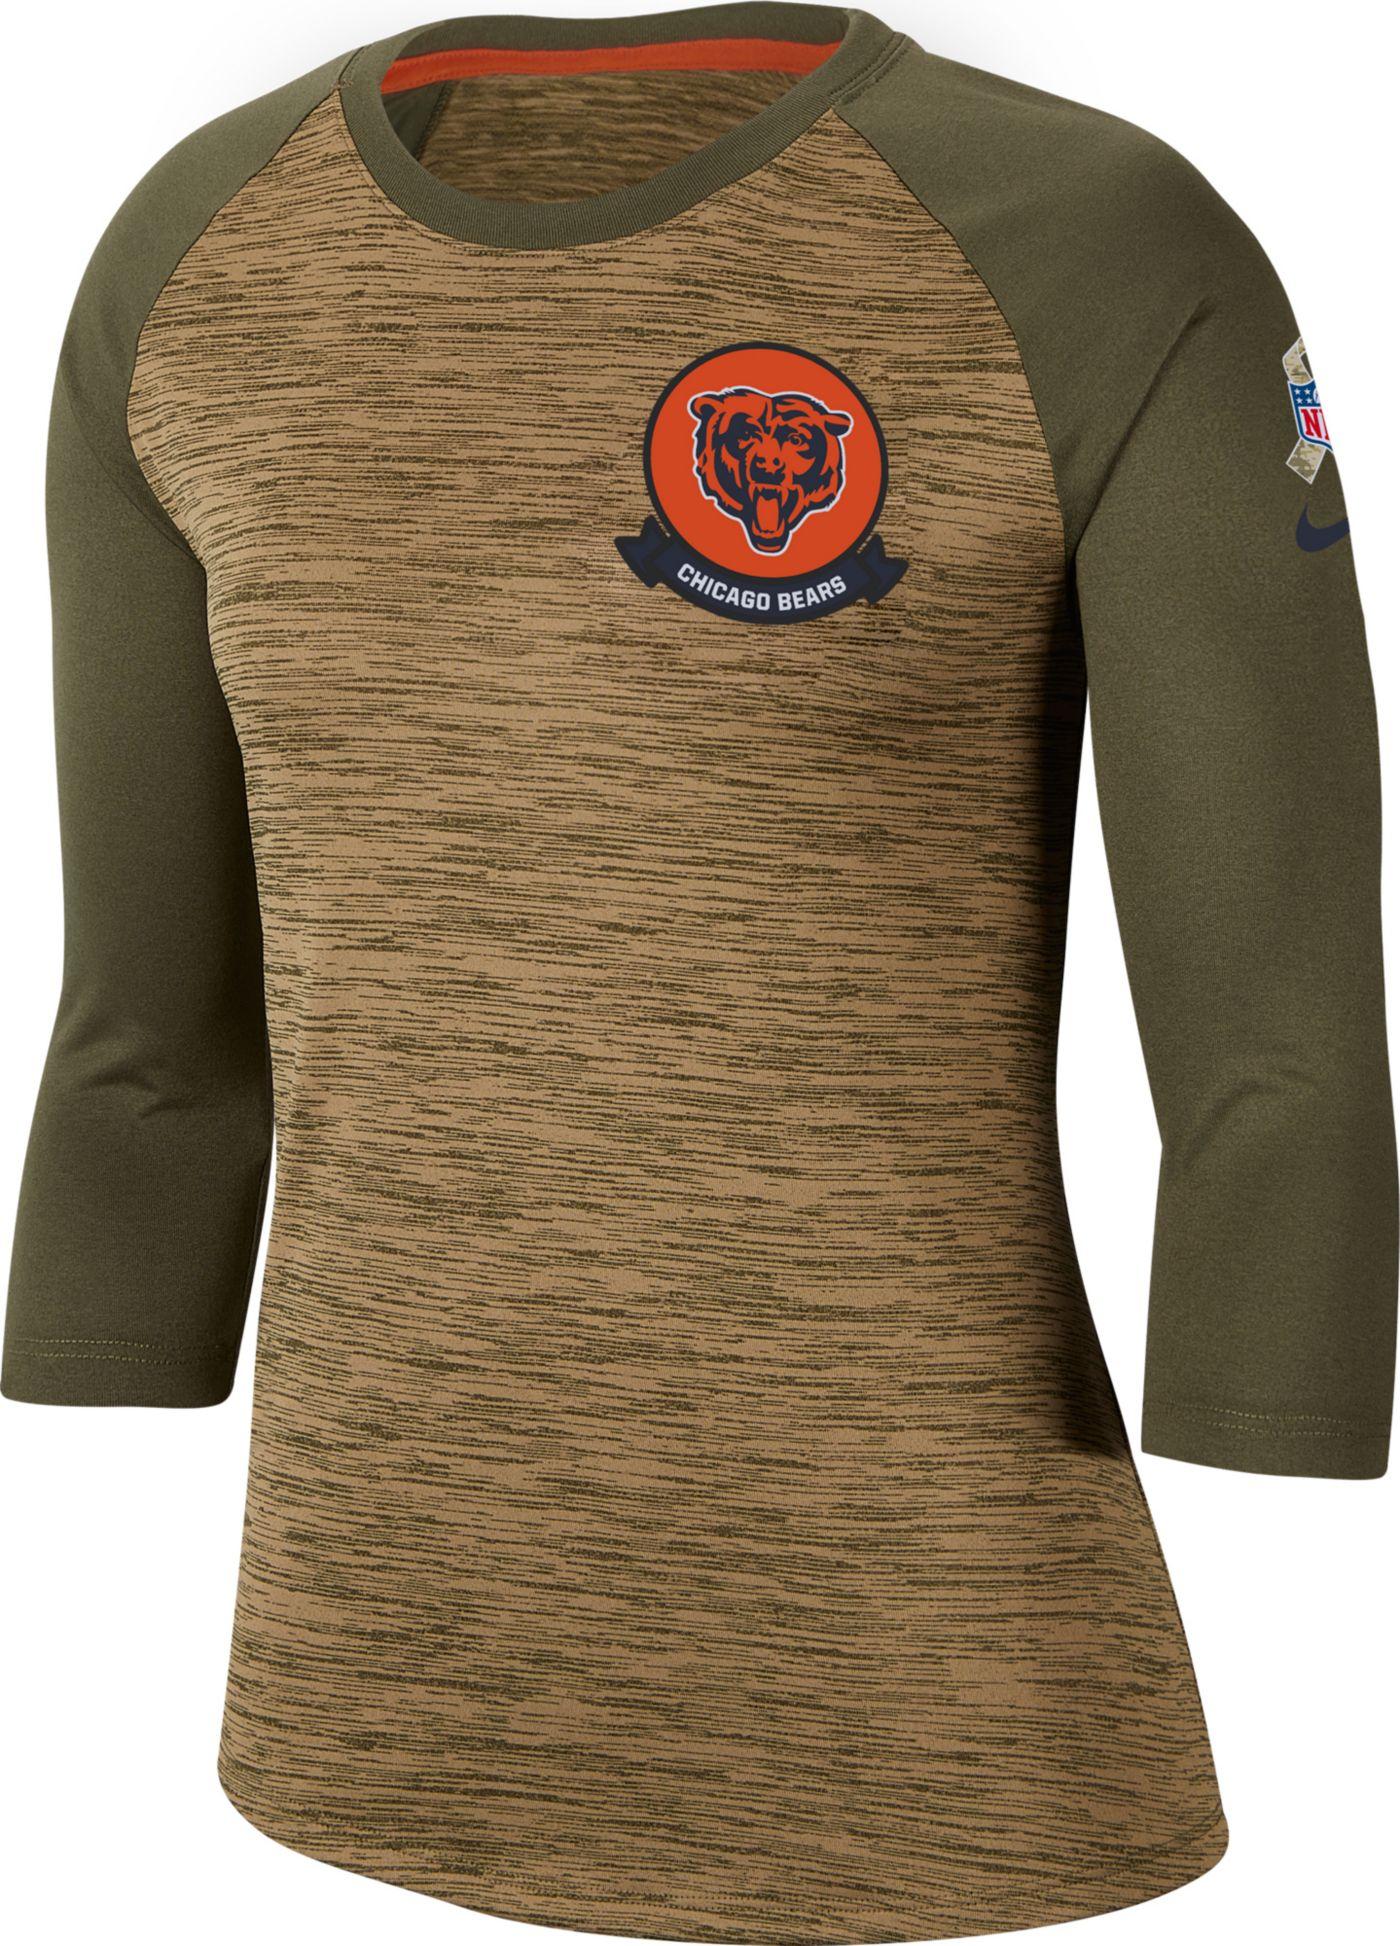 Nike Women's Salute to Service Chicago Bears Dri-FIT Beige Raglan Shirt